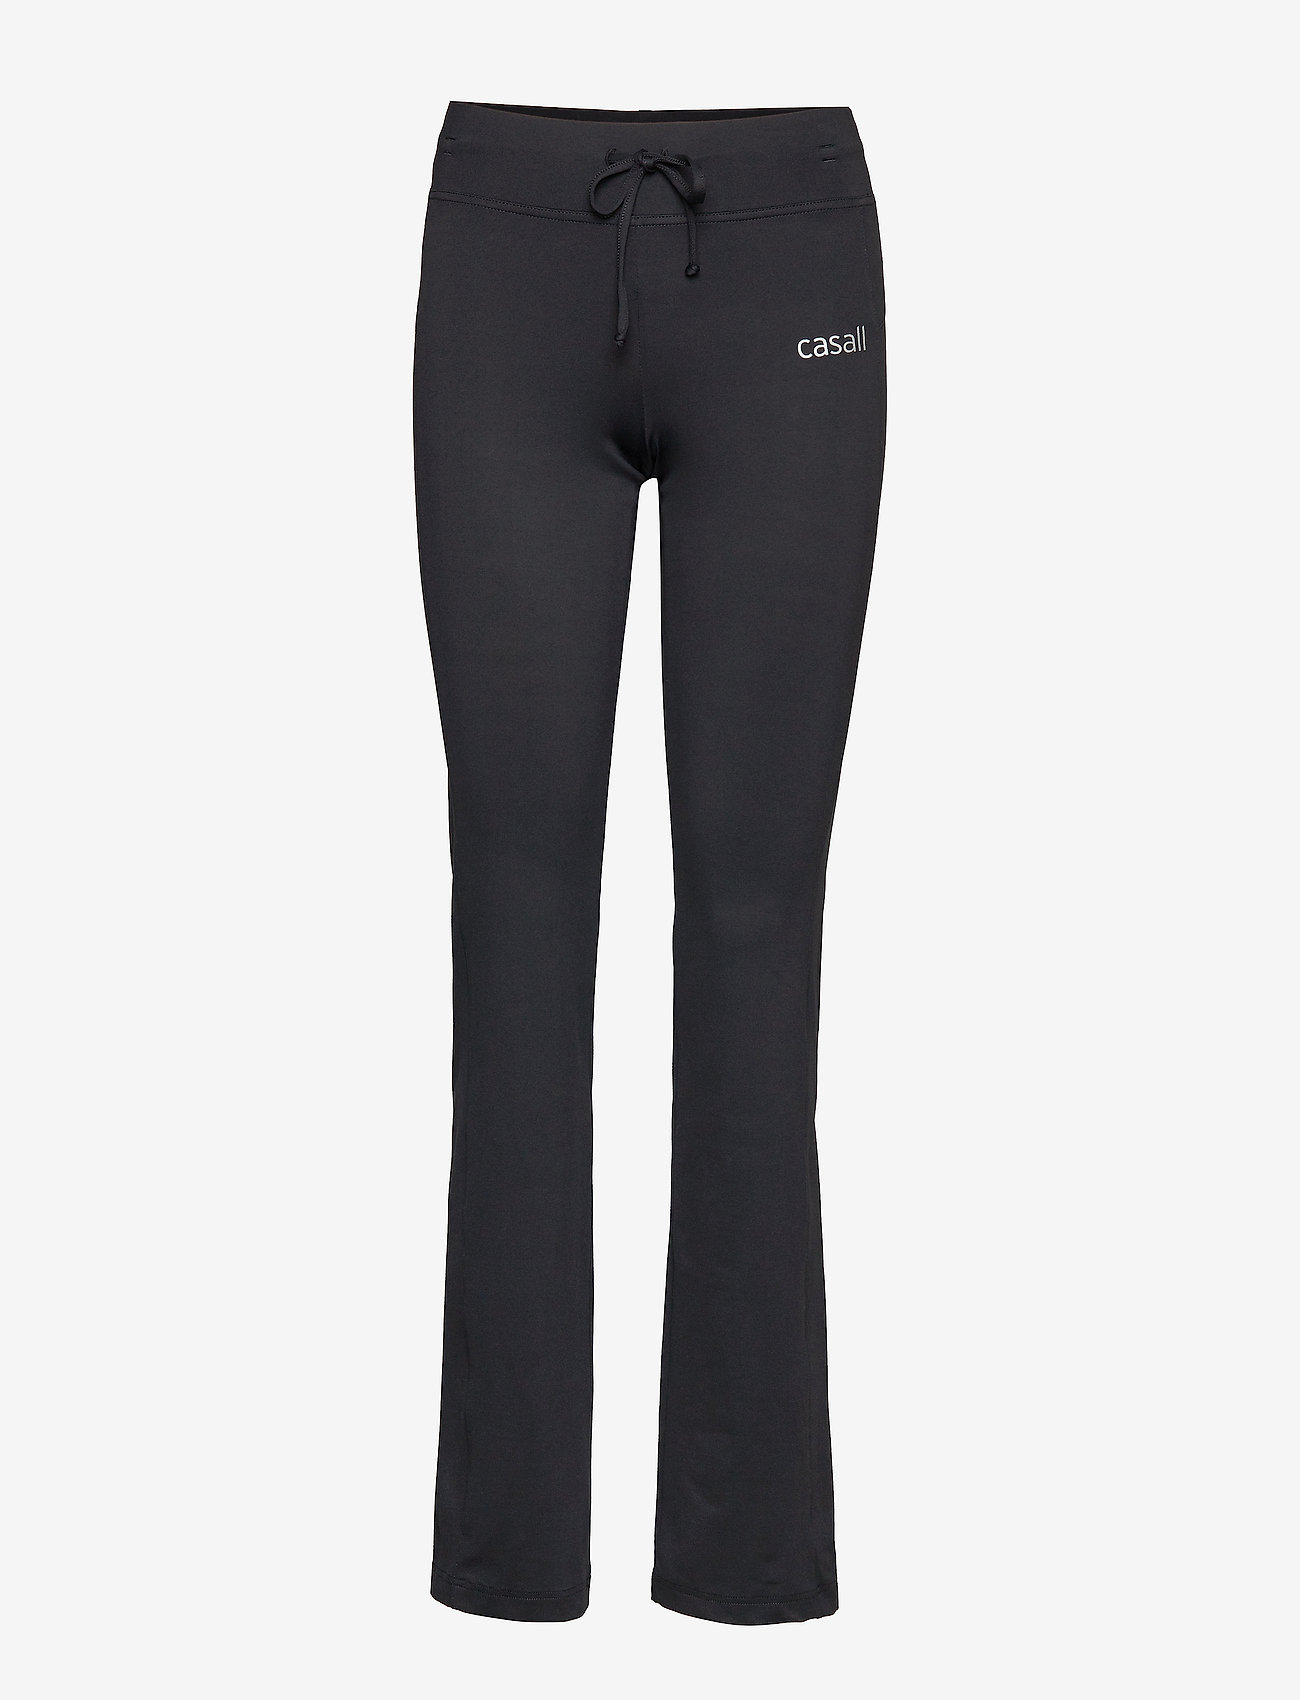 Casall - Essential training pants - treniņu bikses - black - 0